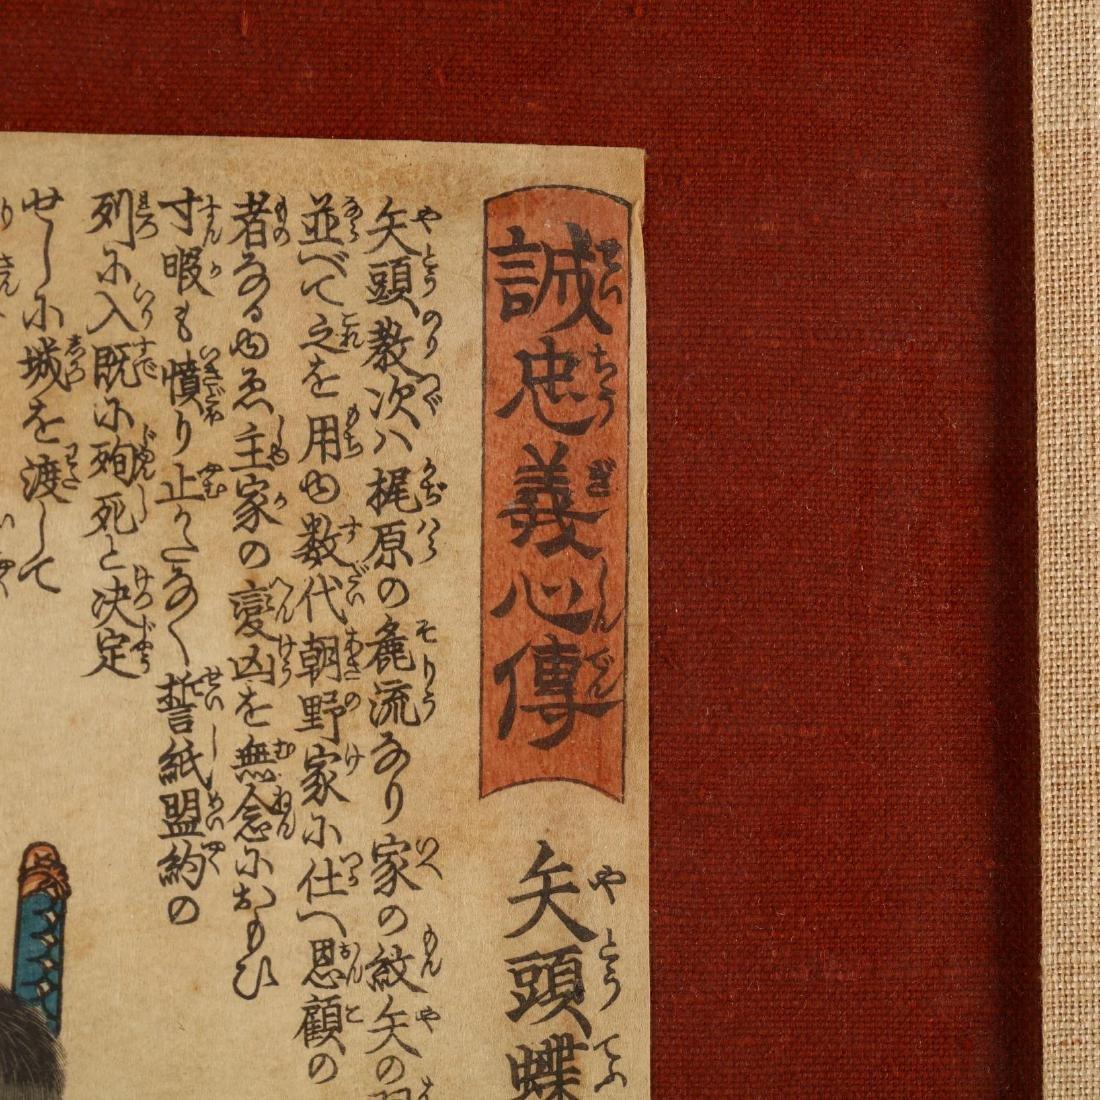 Two Japanese Woodblock Prints by Kunisada and Kuniyoshi - 4